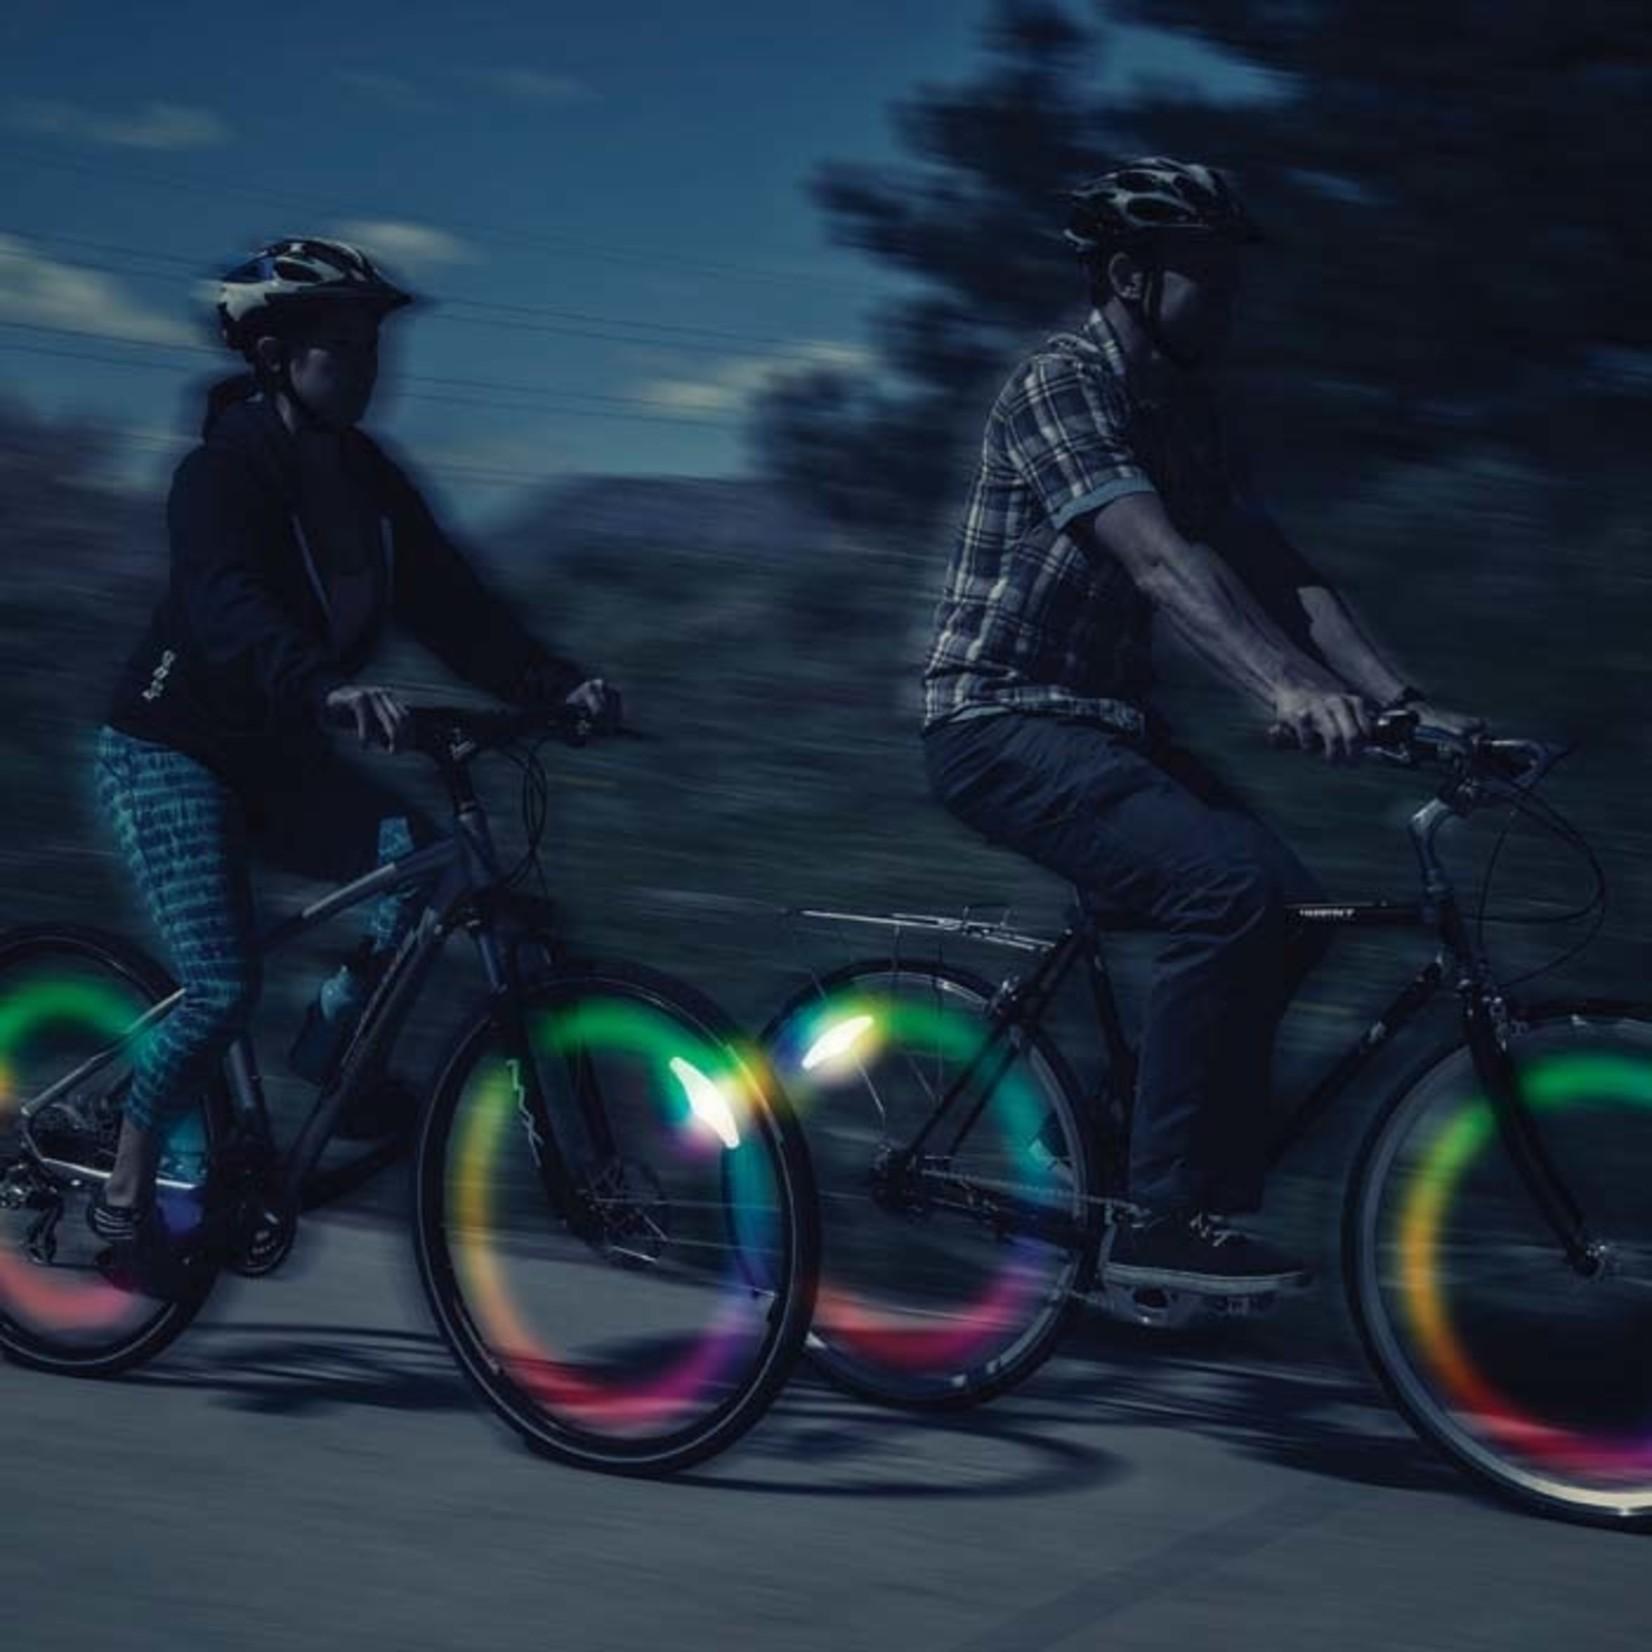 Nite Ize SpokeLit LED Disc-O Select 2-pck